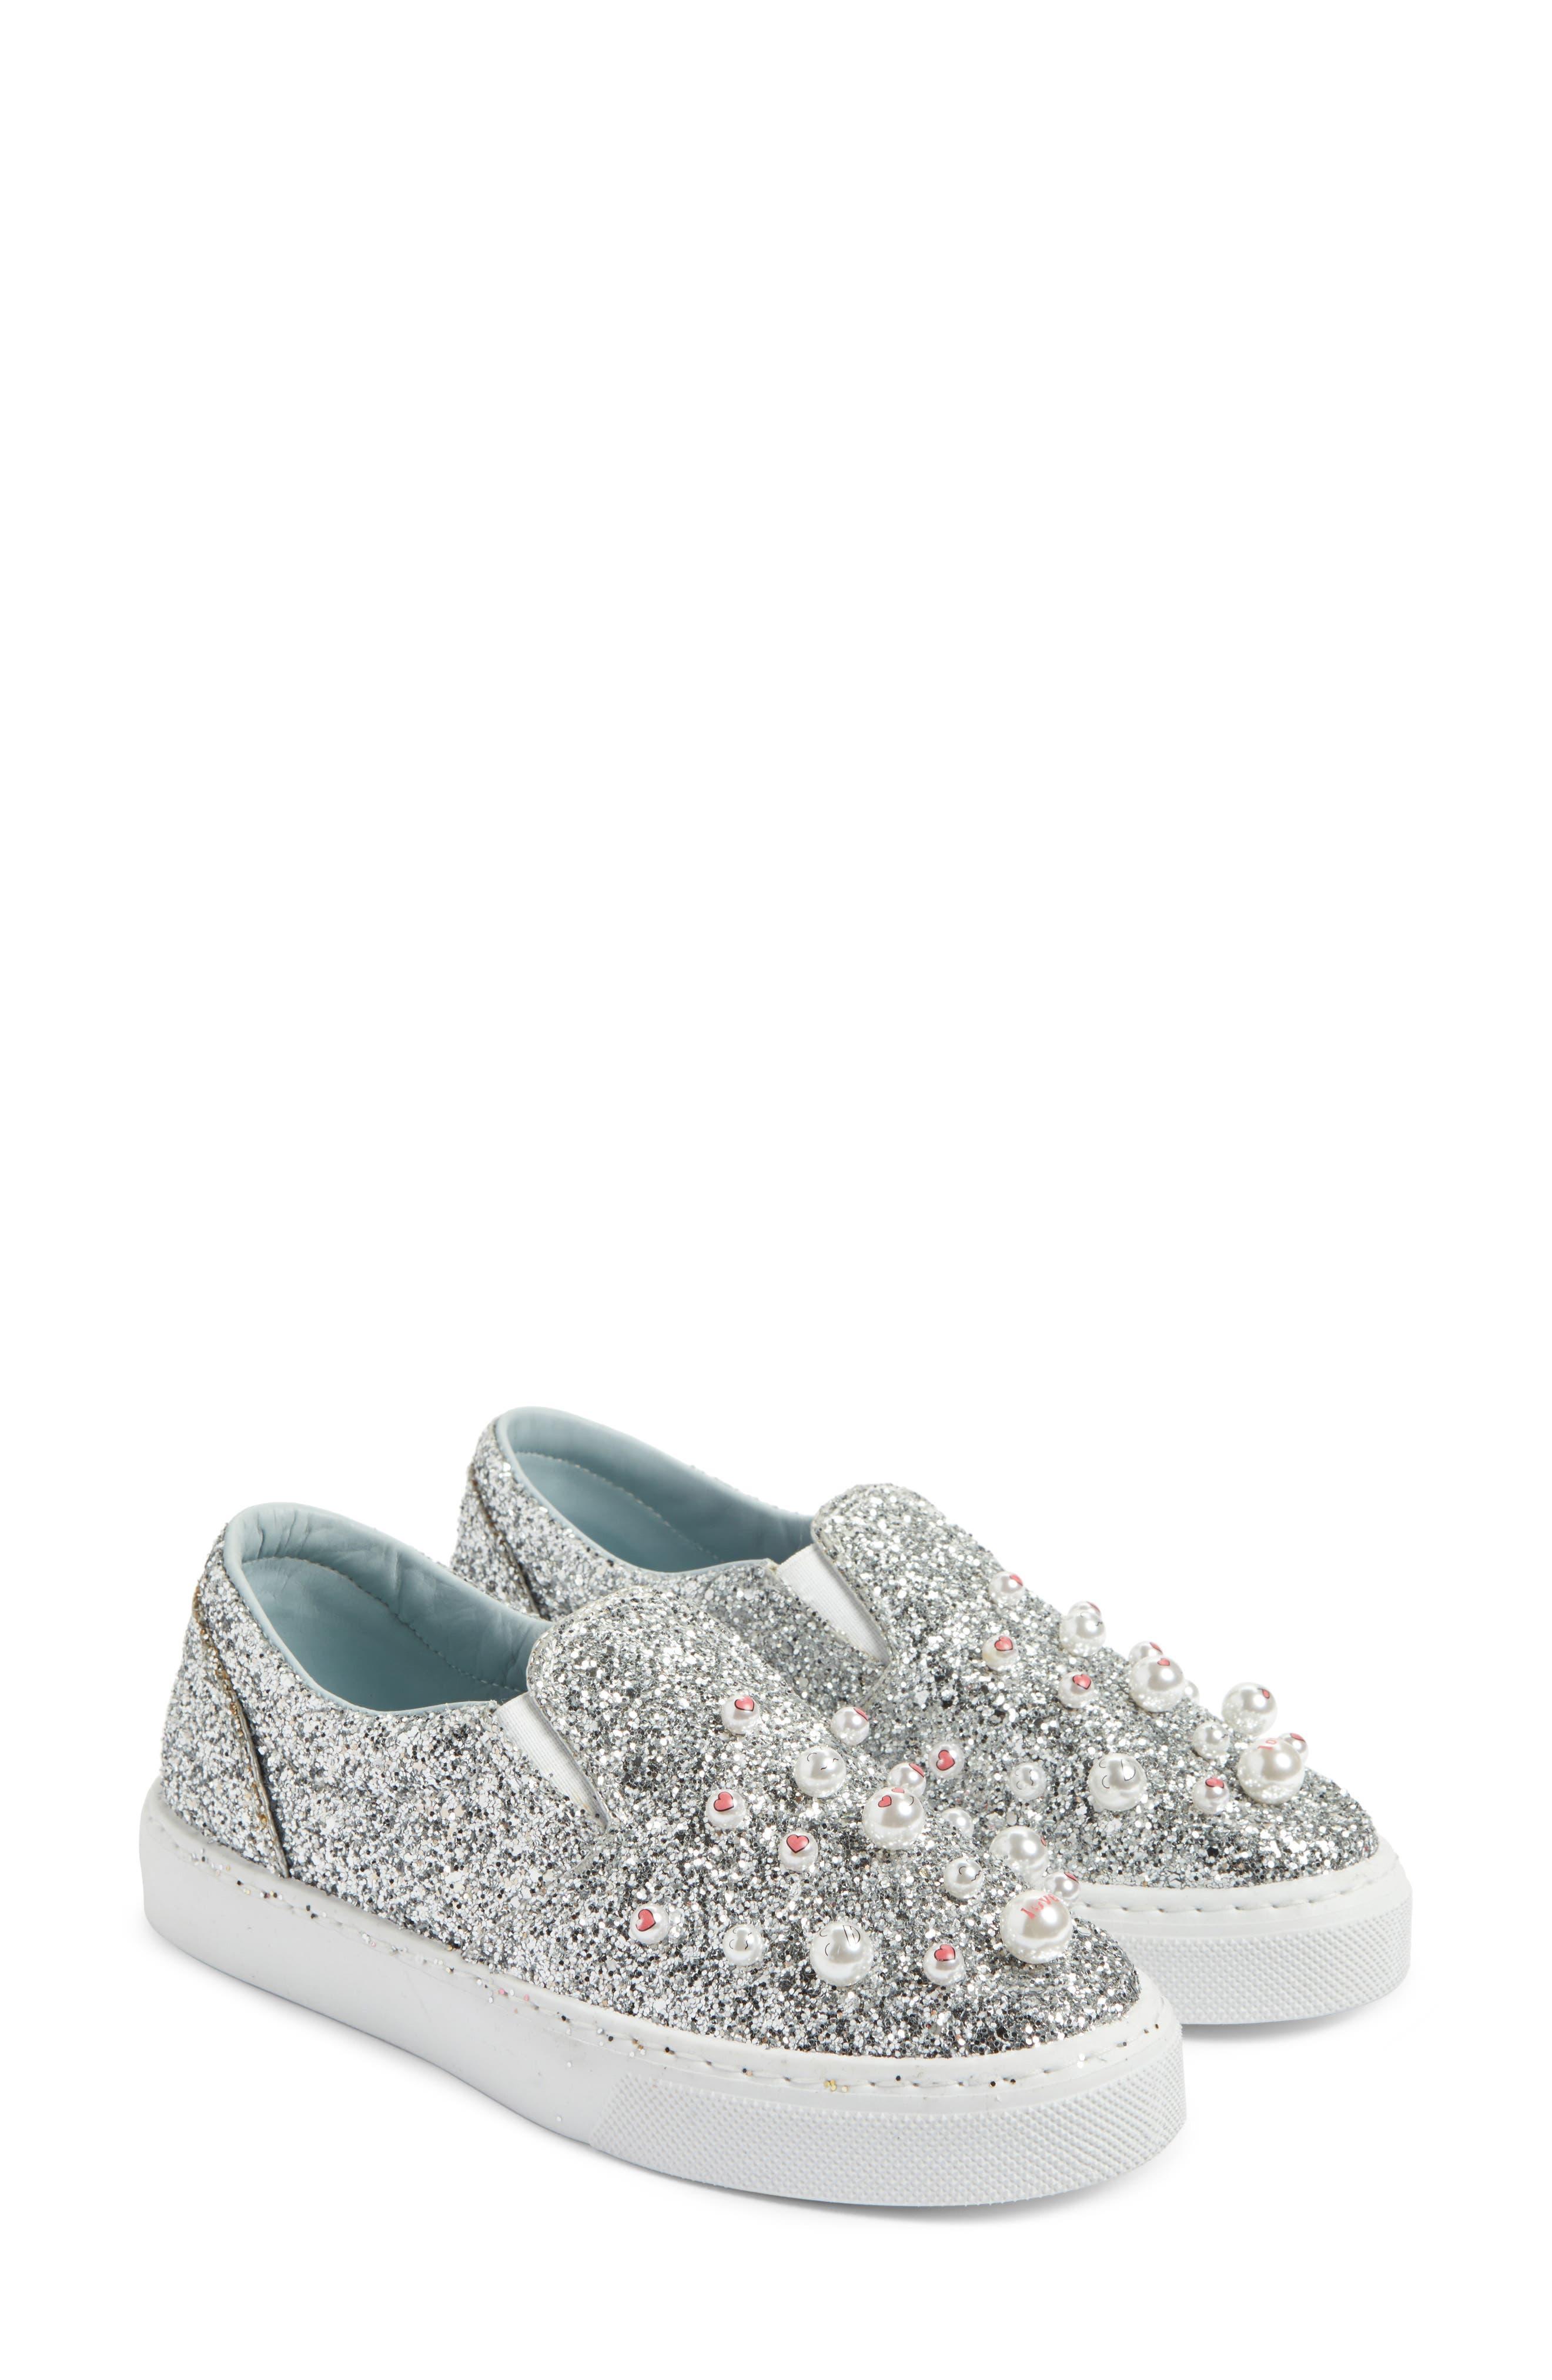 Candies Embellished Slip-On Sneaker,                             Alternate thumbnail 2, color,                             Silver